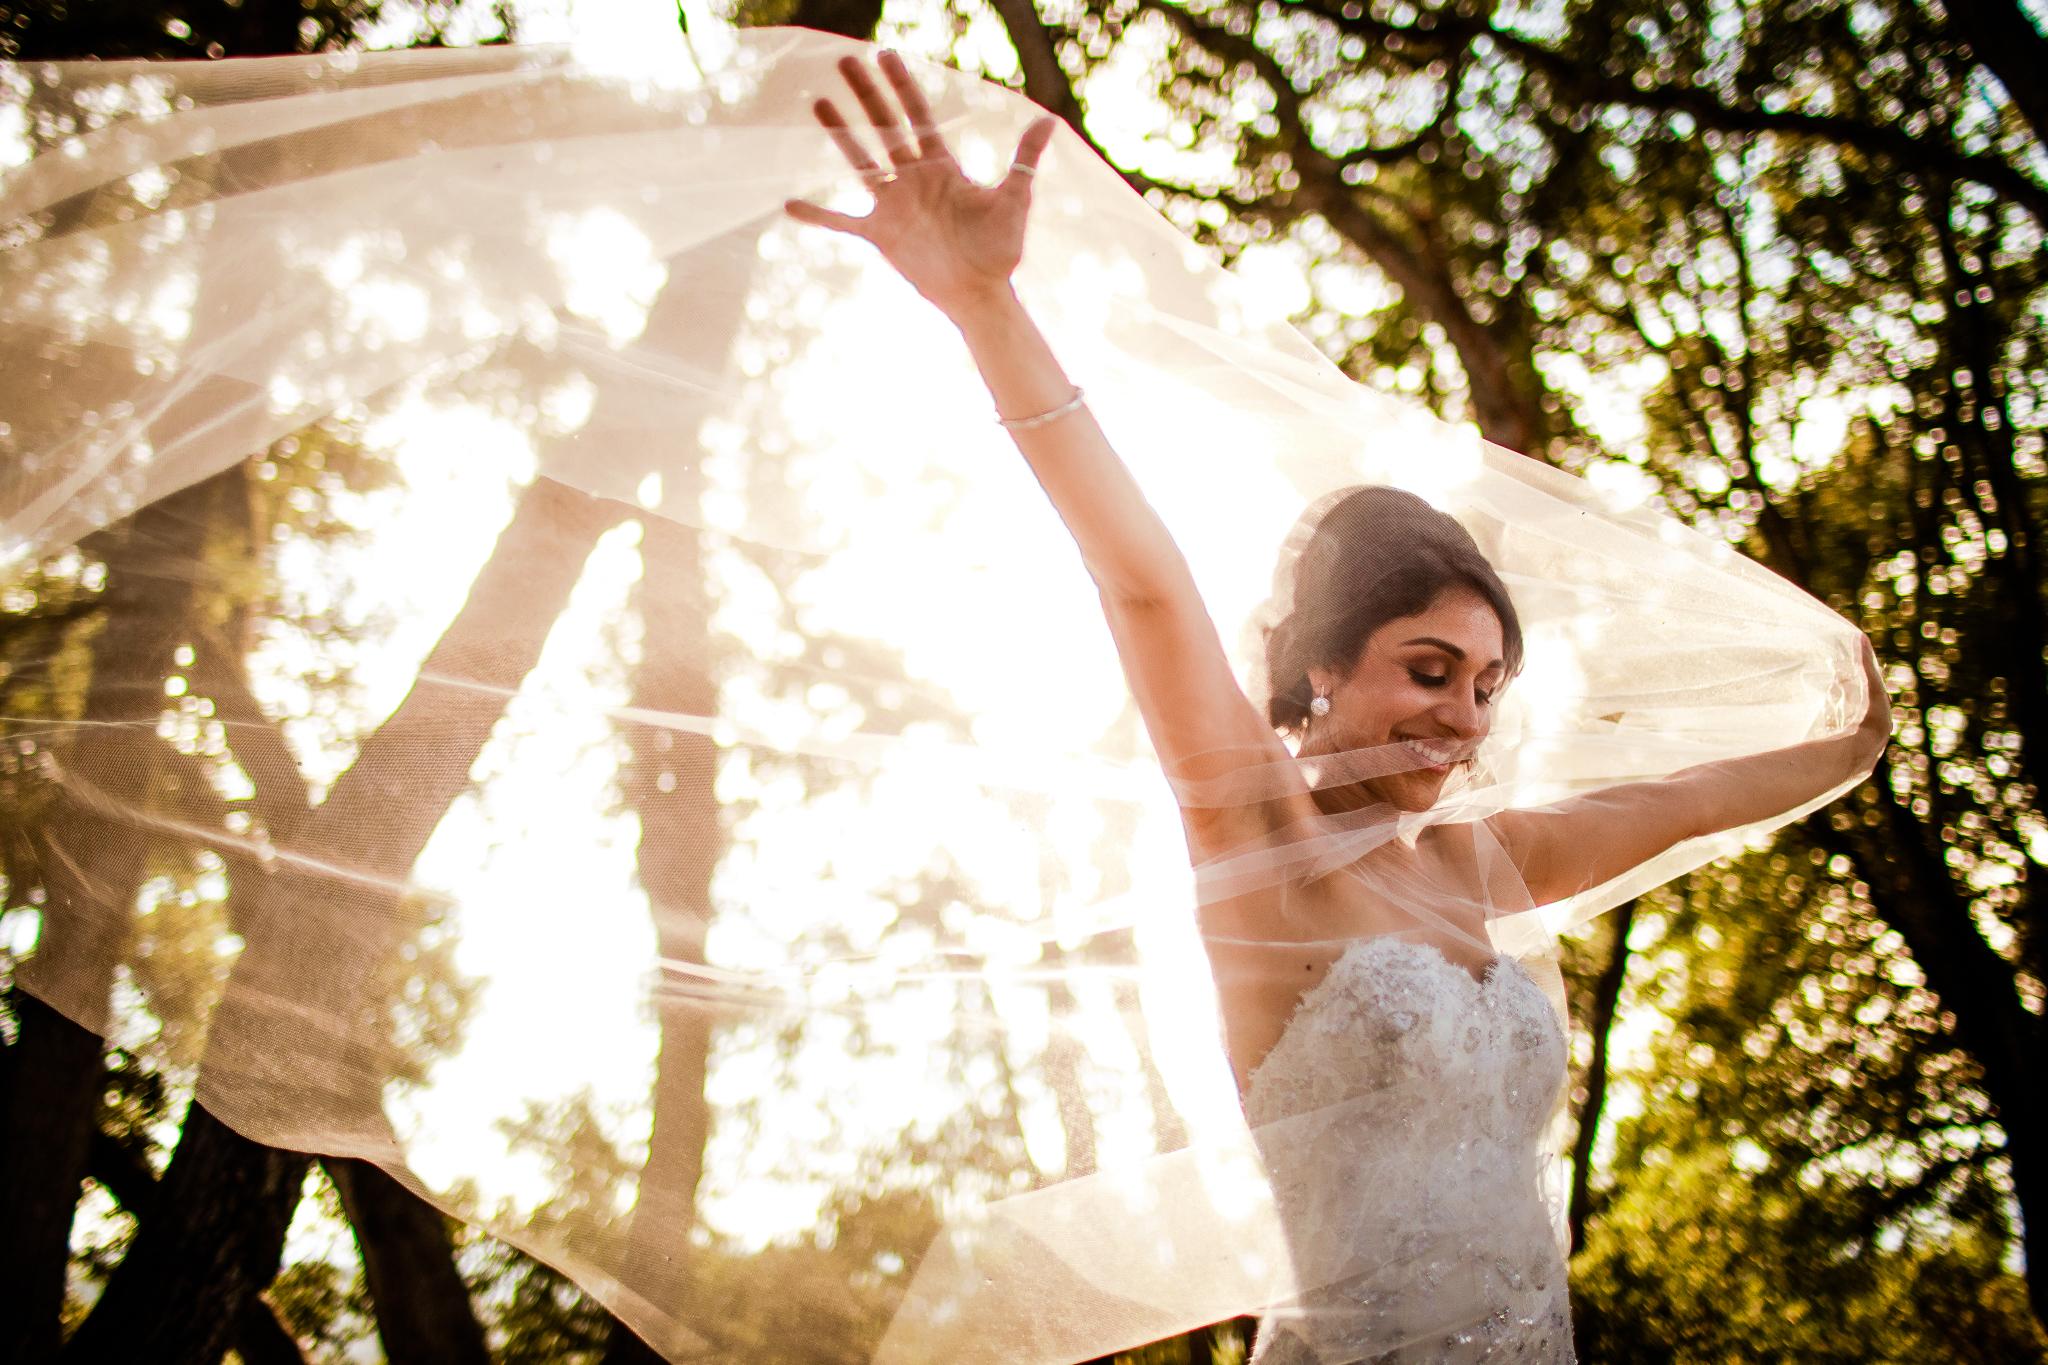 san diego wedding photographer | woman walking through veil